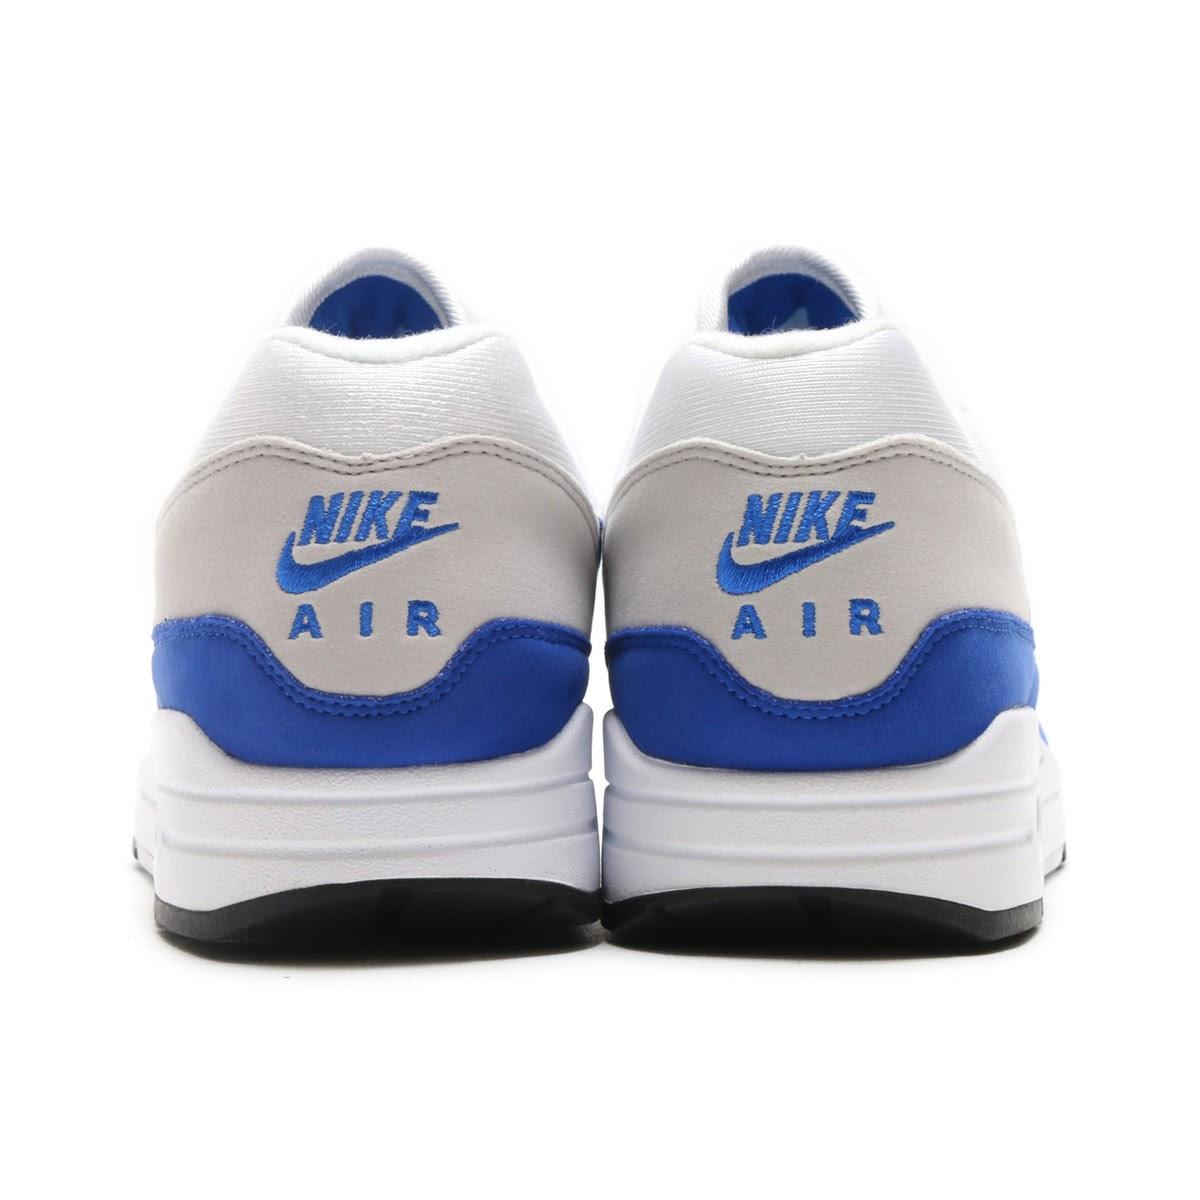 online retailer 1d3ce 5e732 NIKE AIR MAX 1 ANNIVERSARY (Kie Ney AMAX 1 anniversary) (WHITE GAME ROYAL-NEUTRAL  GREY-BLACK) 17HO-S